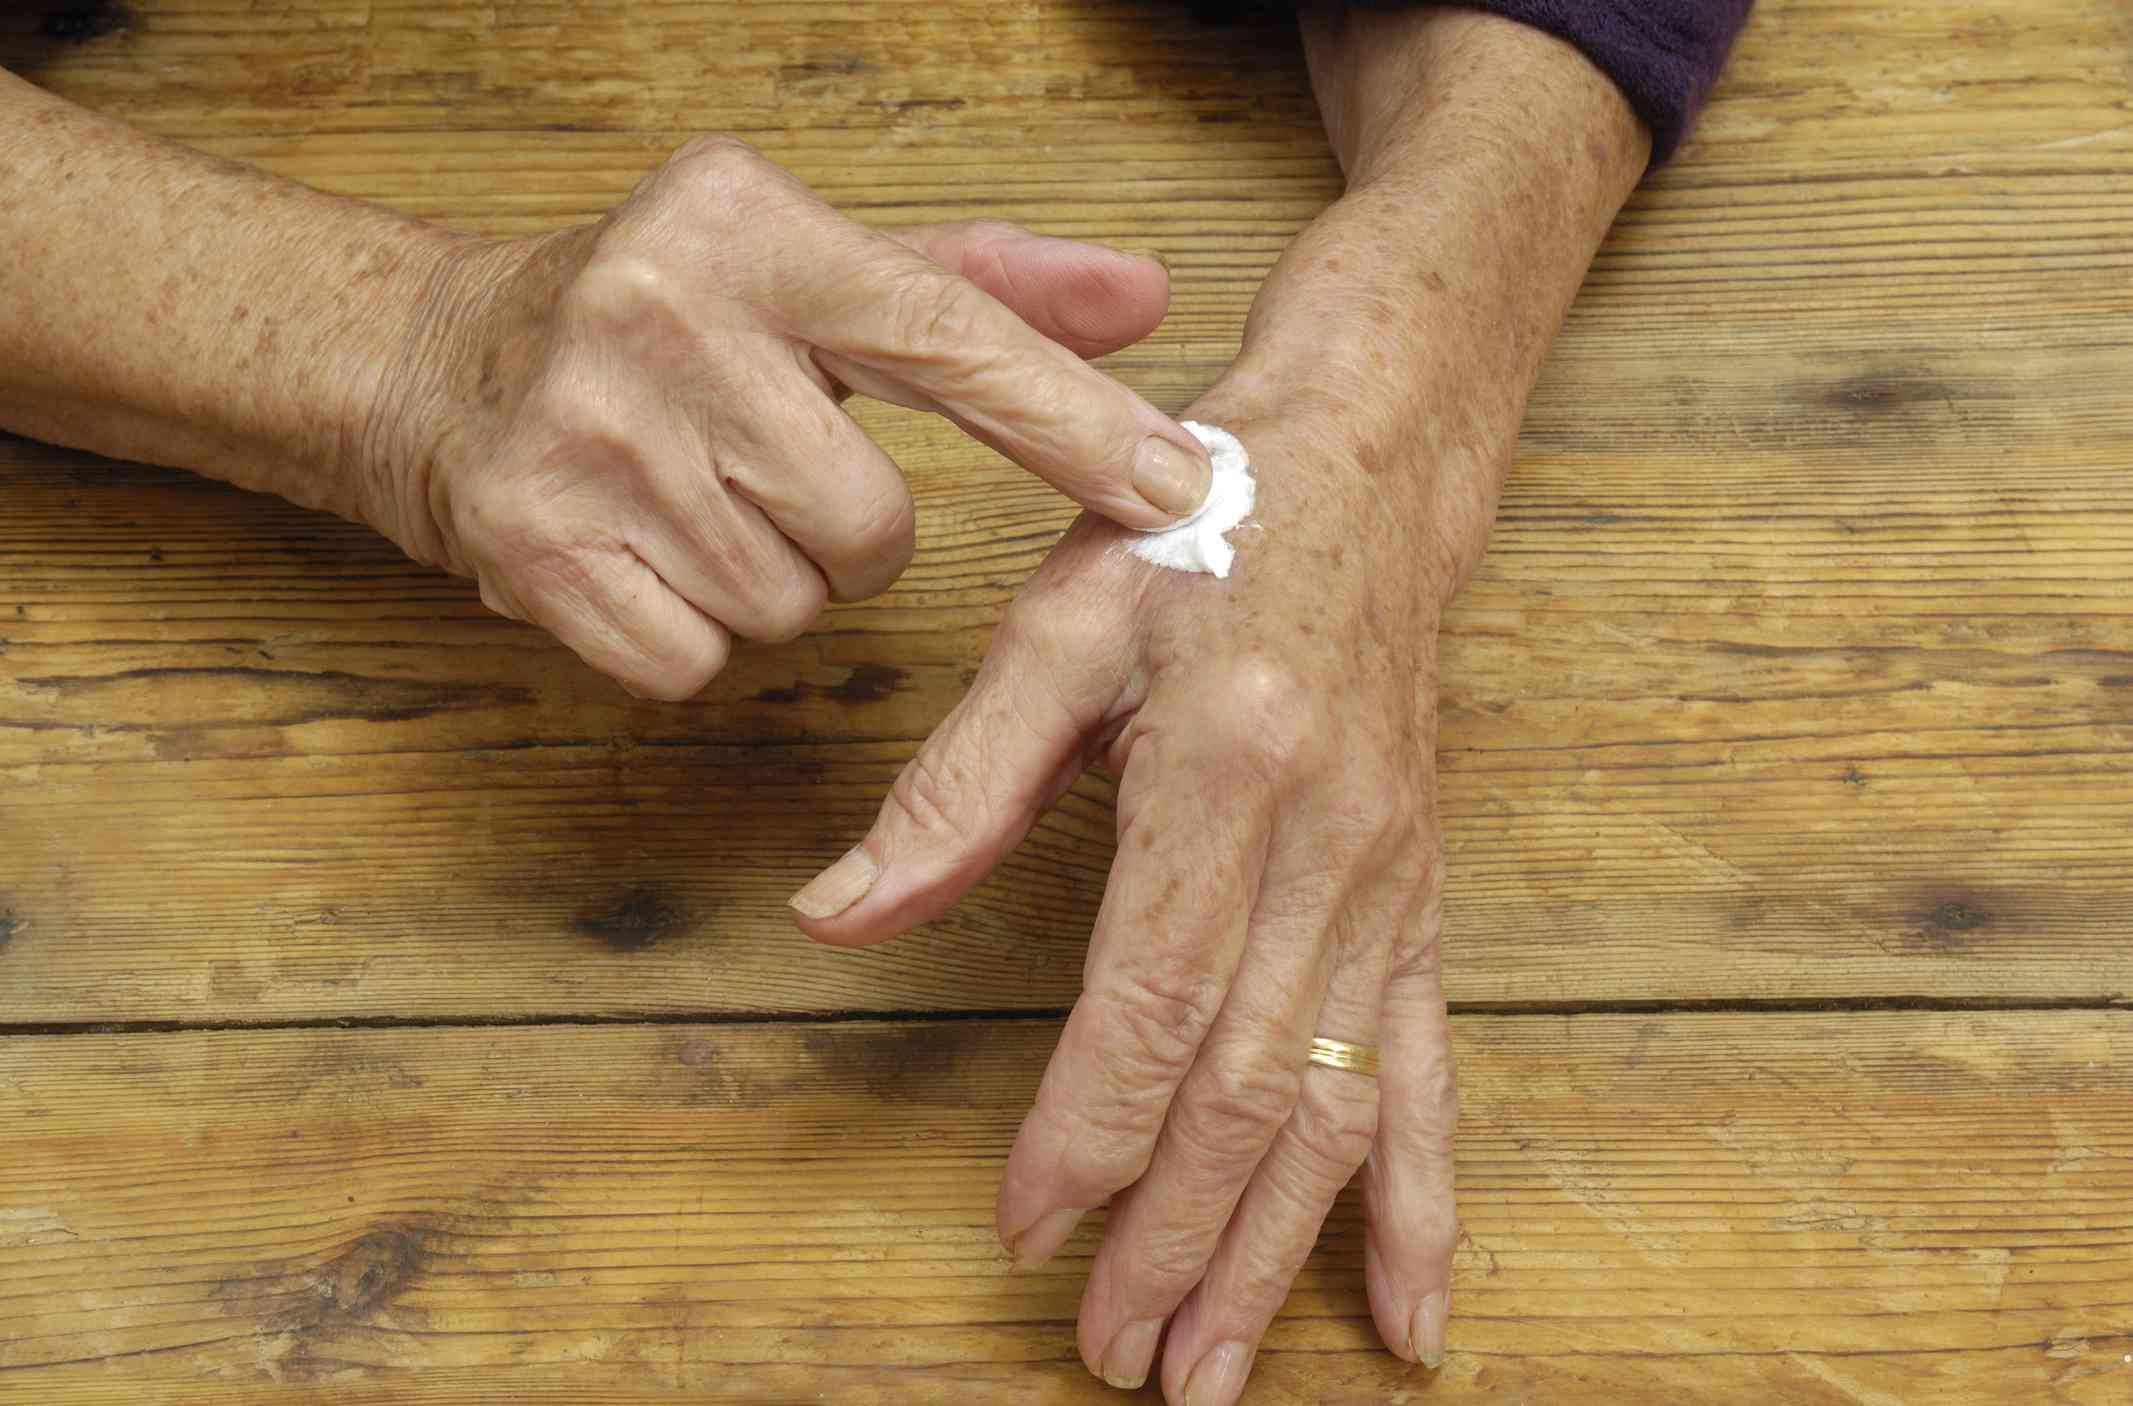 Applying Zostrix capsaicin cream to hand